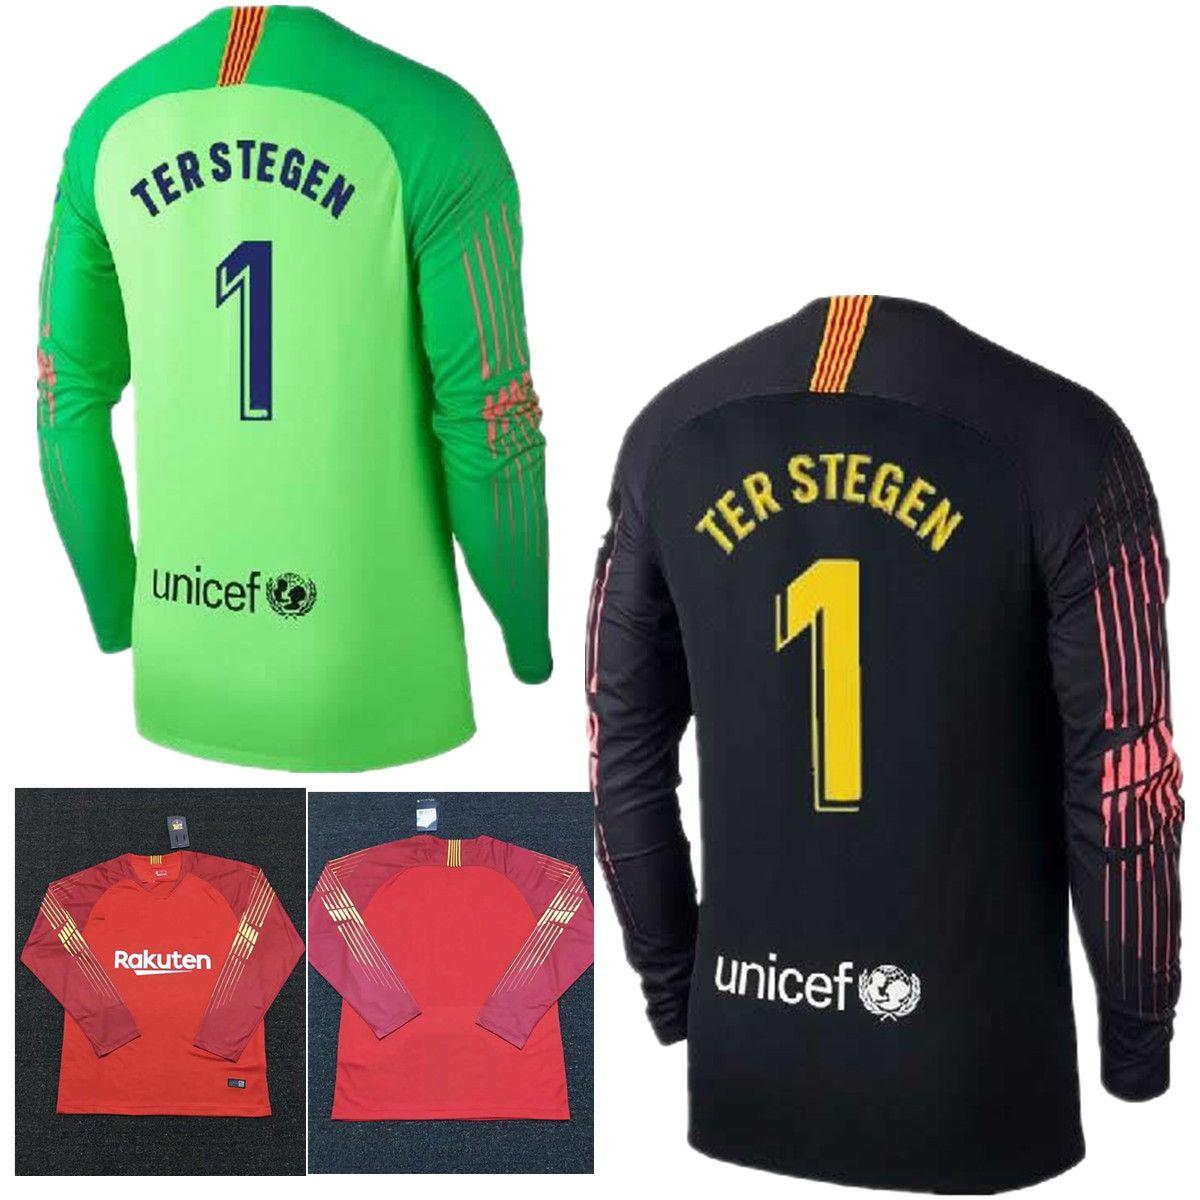 2018 2019 Adultos Camiseta De Fútbol De Manga Larga Ter Stegen Goalkeeper  Jersey   1 Marc Andre Ter Stegen Camiseta De Portero Black Orange Camisetas  De ... d4673d62c5ecb